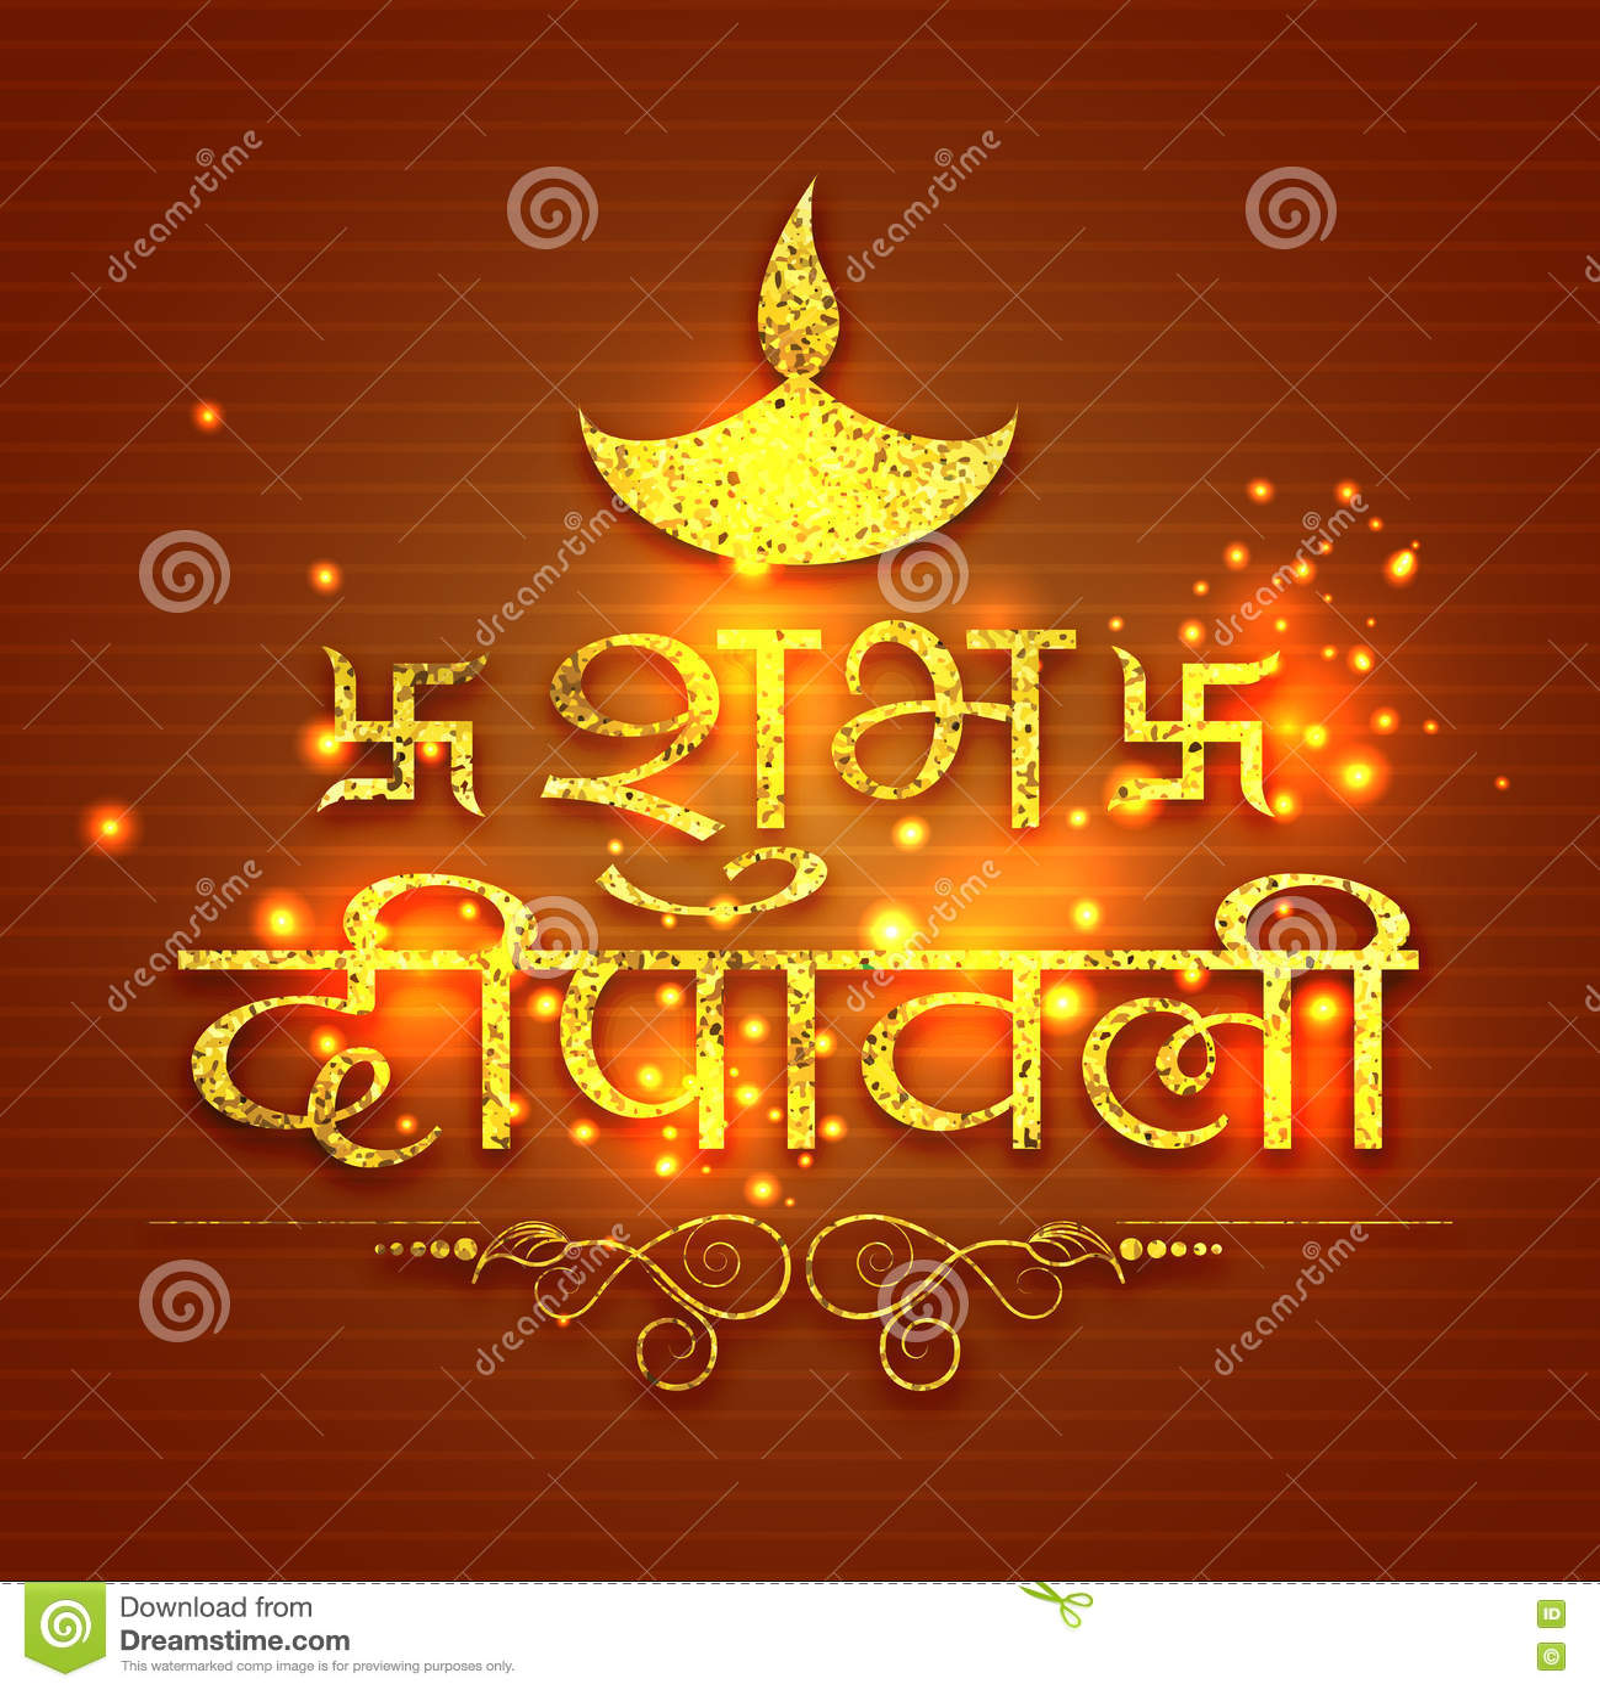 Greeting Card For Happy Diwali Celebration Stock Illustration